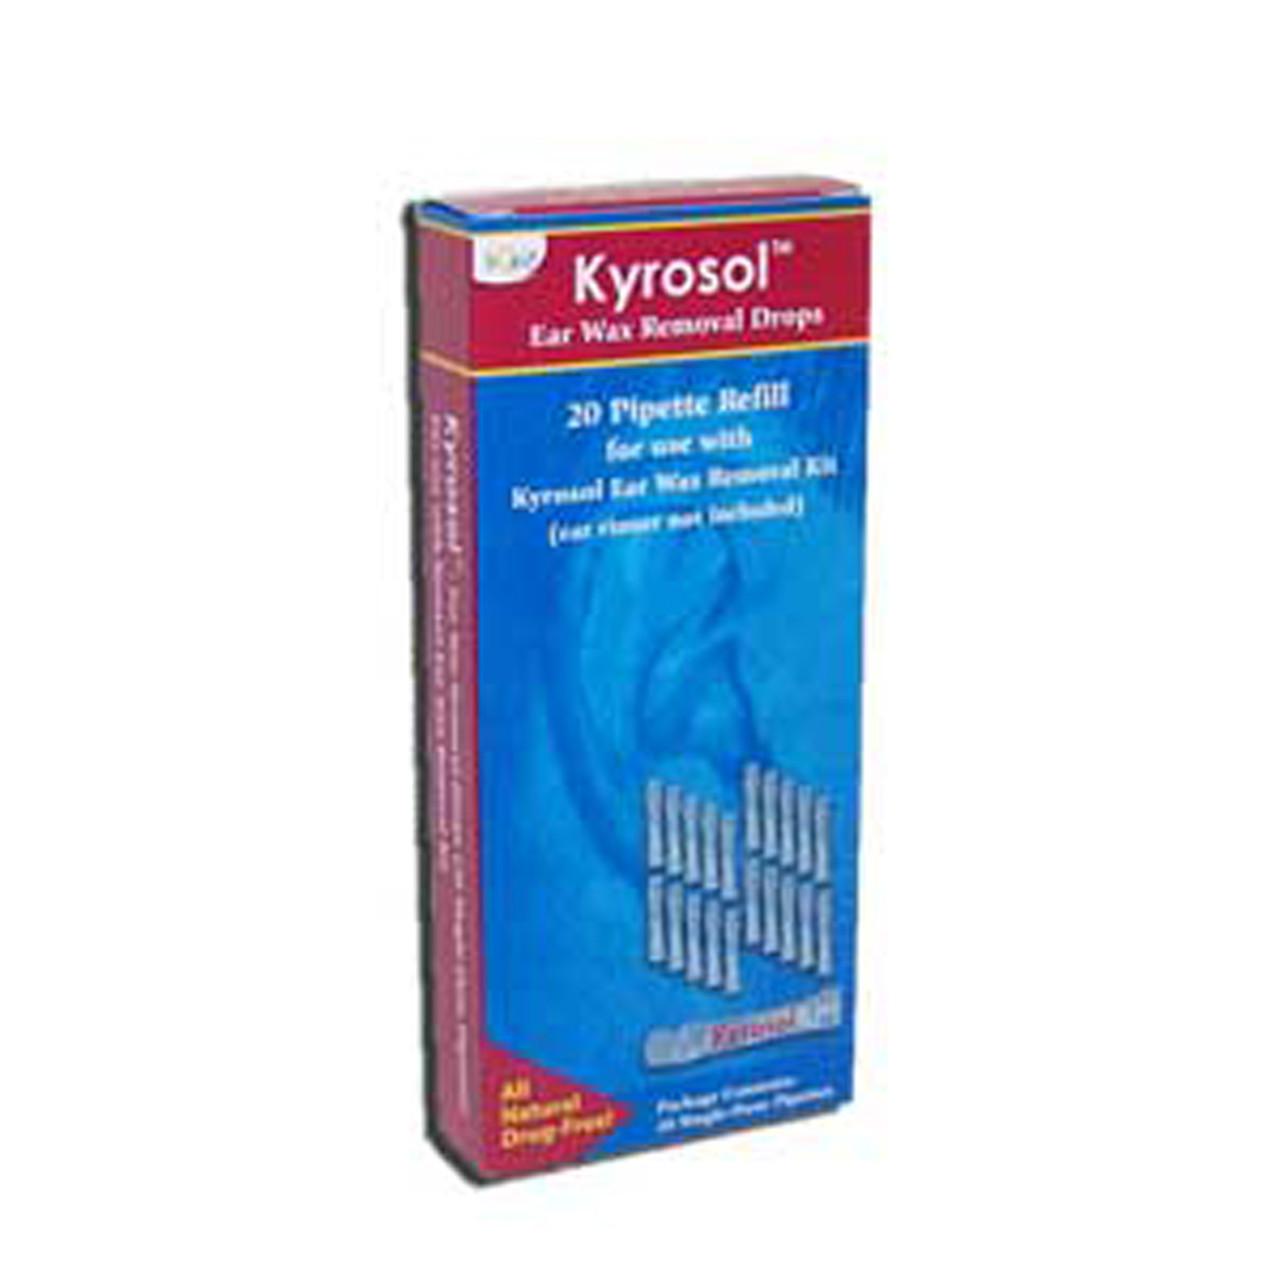 Kyrosol - Ear Wax Removal Drops